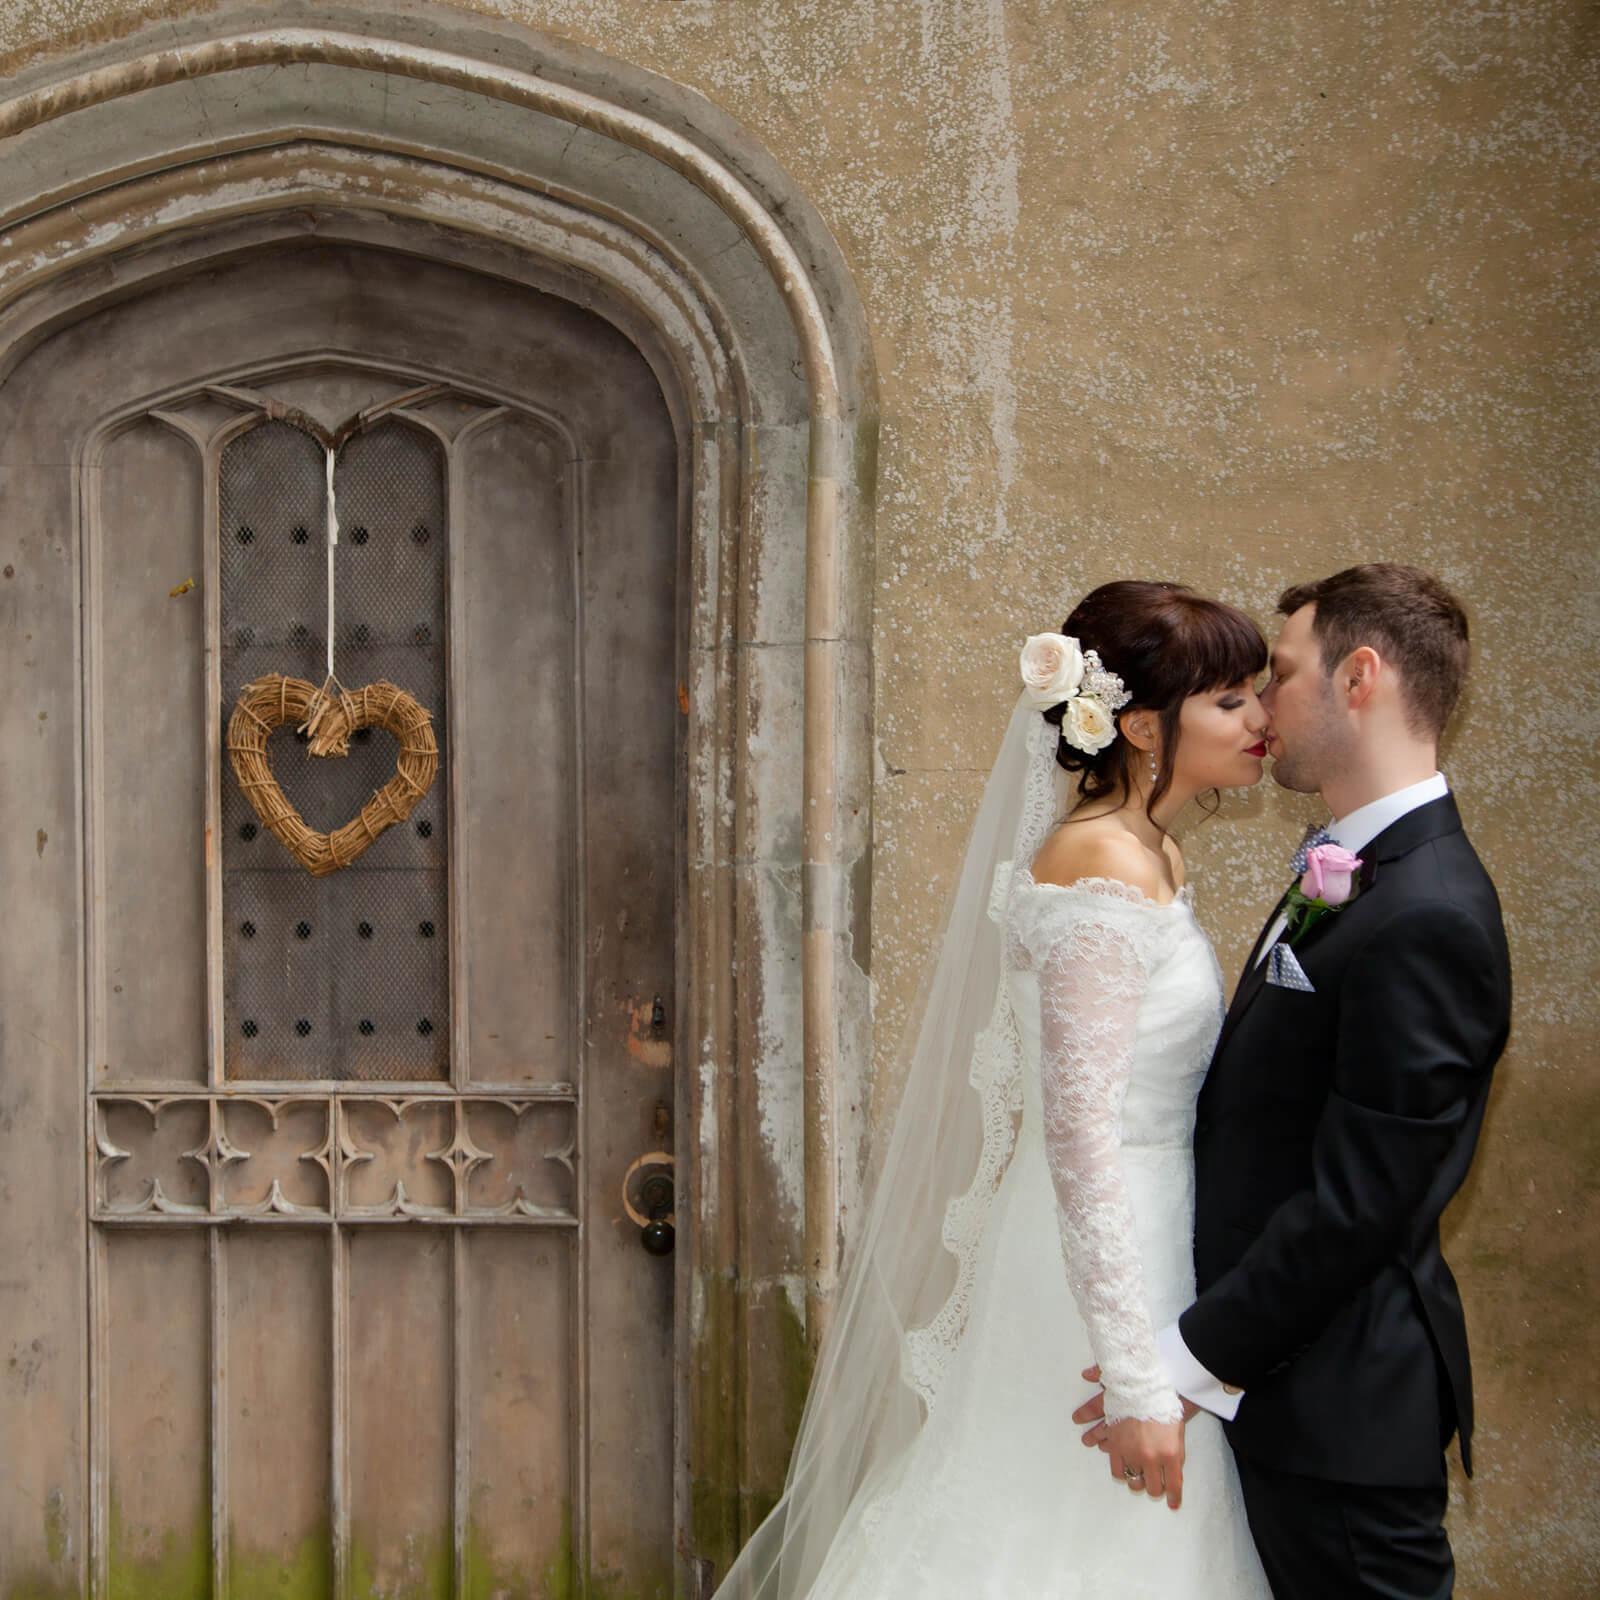 Warwickshire-wedding-photography-7